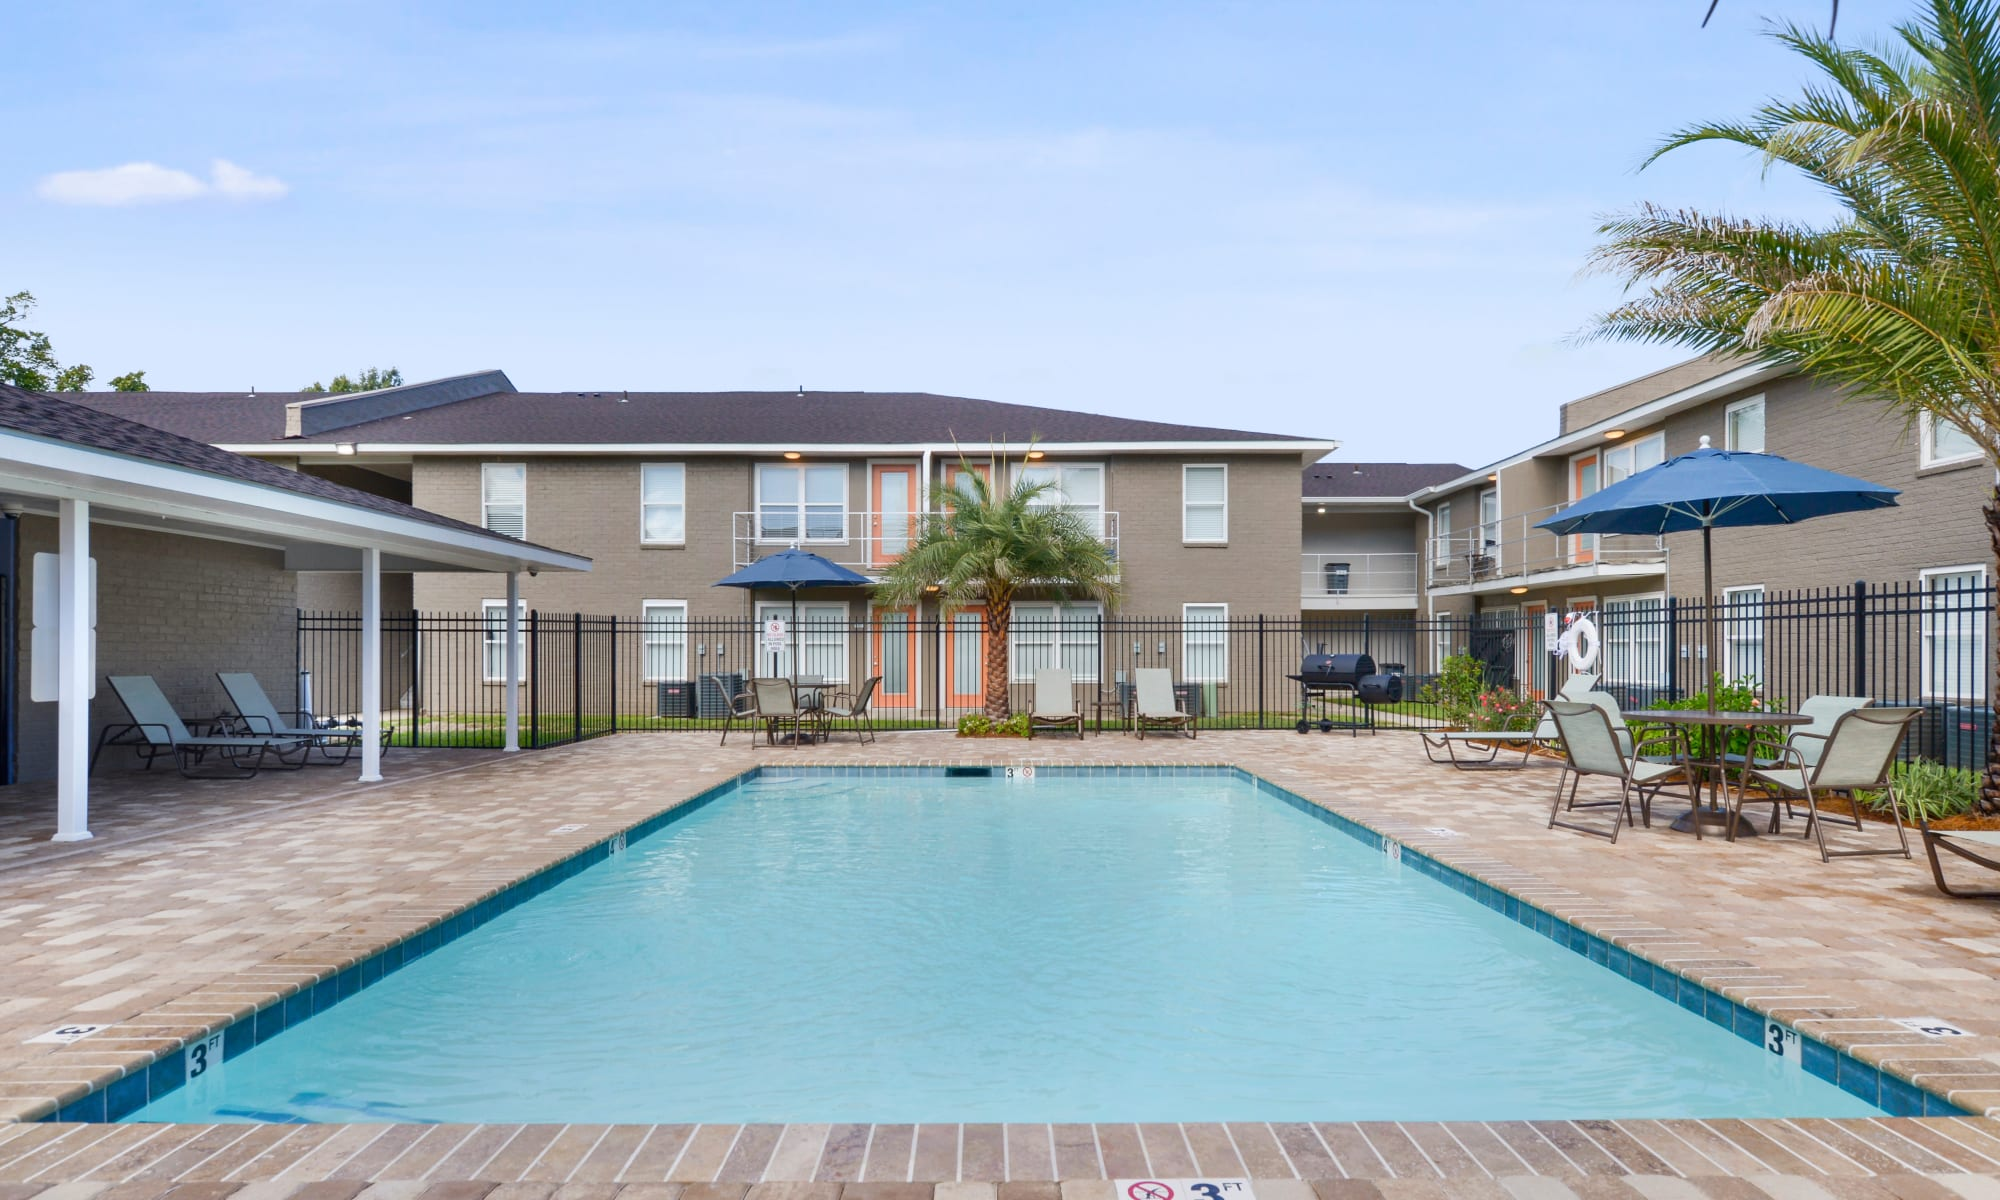 Apartments in Baton Rouge, LA